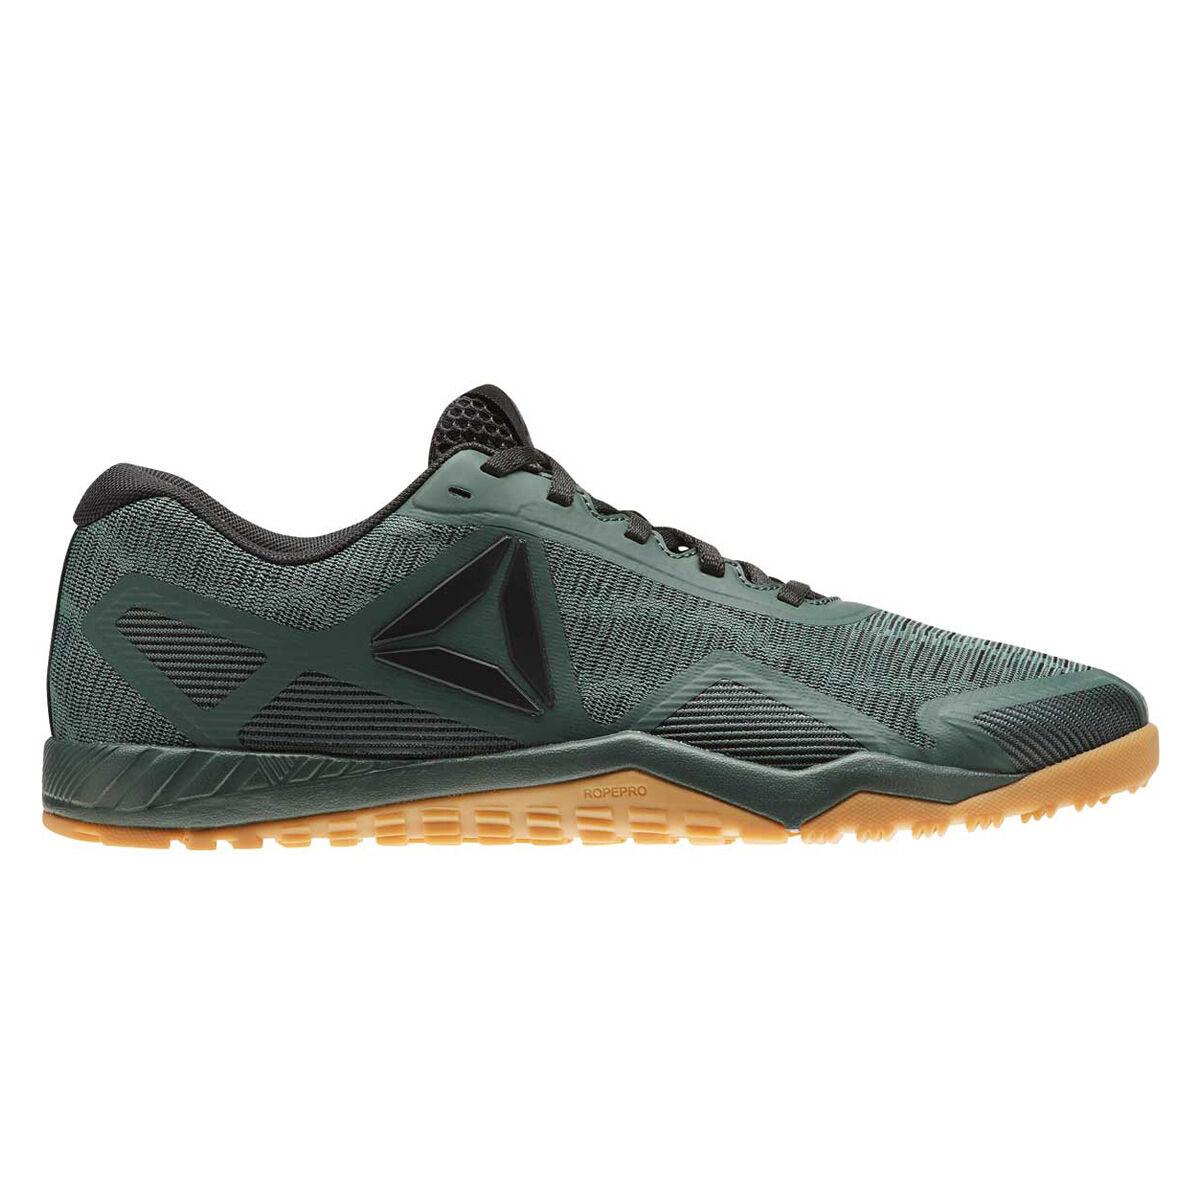 Reebok Workout TR 2.0 Mens Training Shoes Grey Black US 8